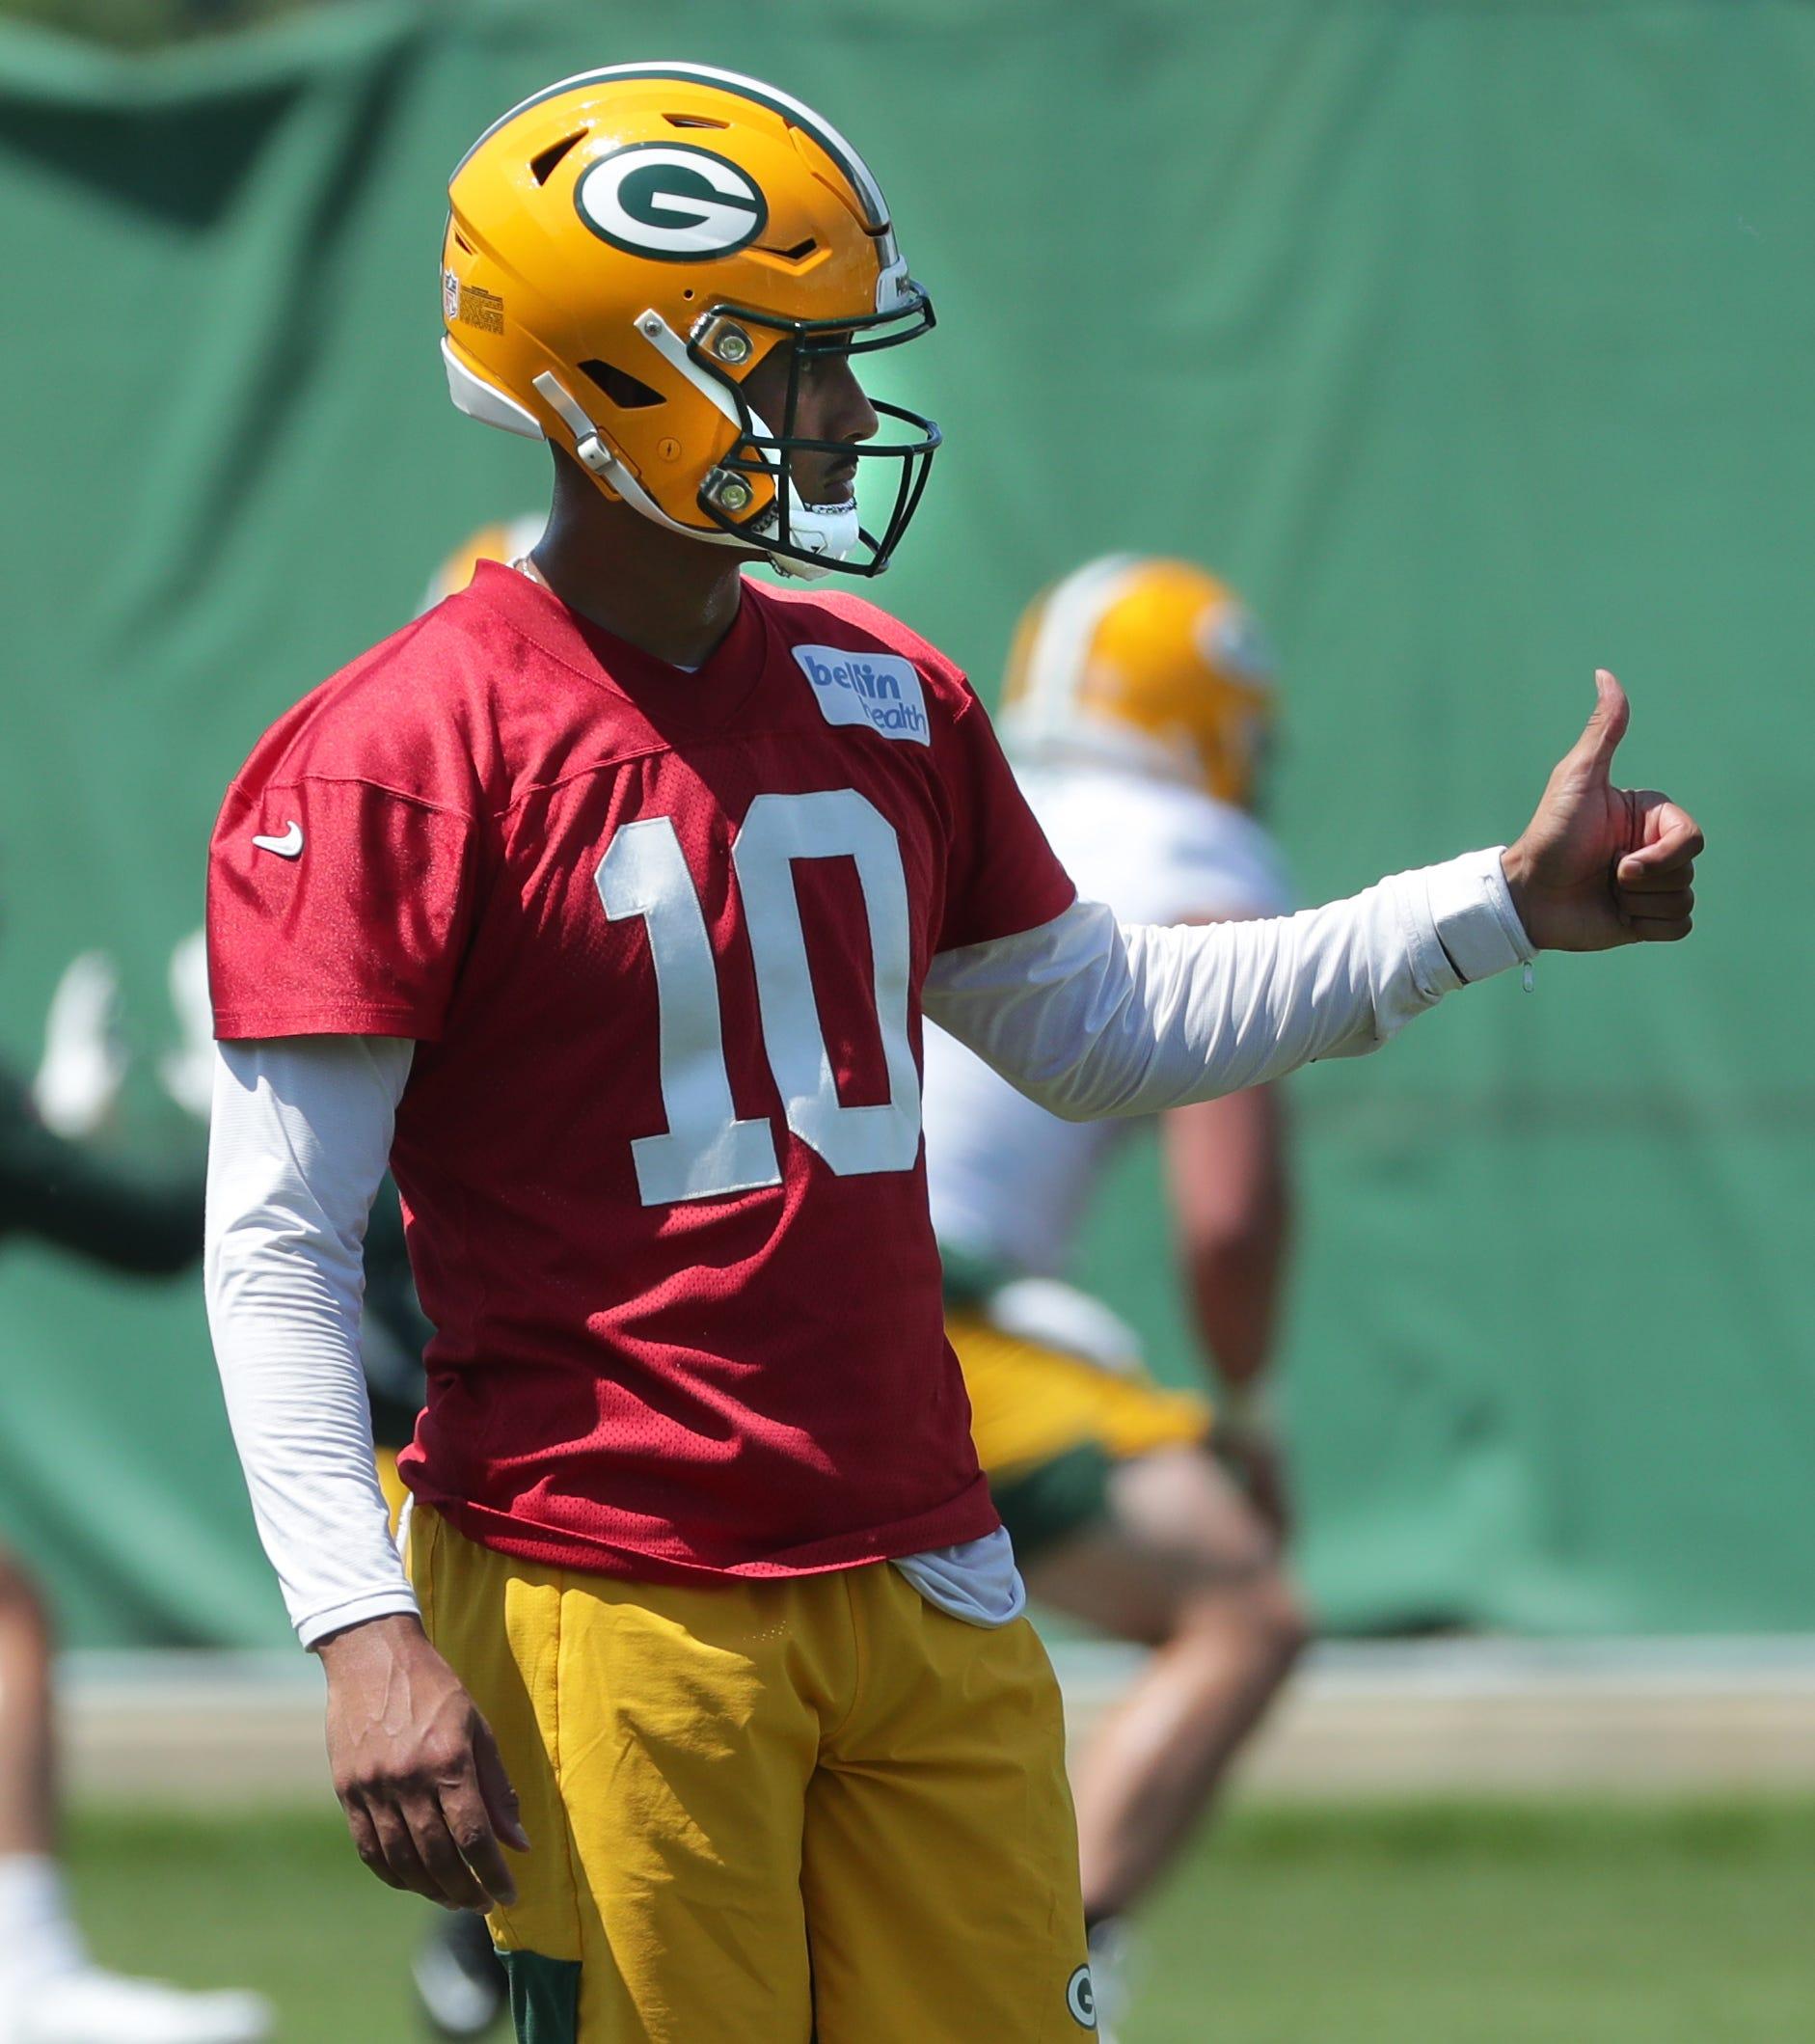 Aaron Rodgers' absence, Jordan Love's struggles overshadow Green Bay Packers minicamp